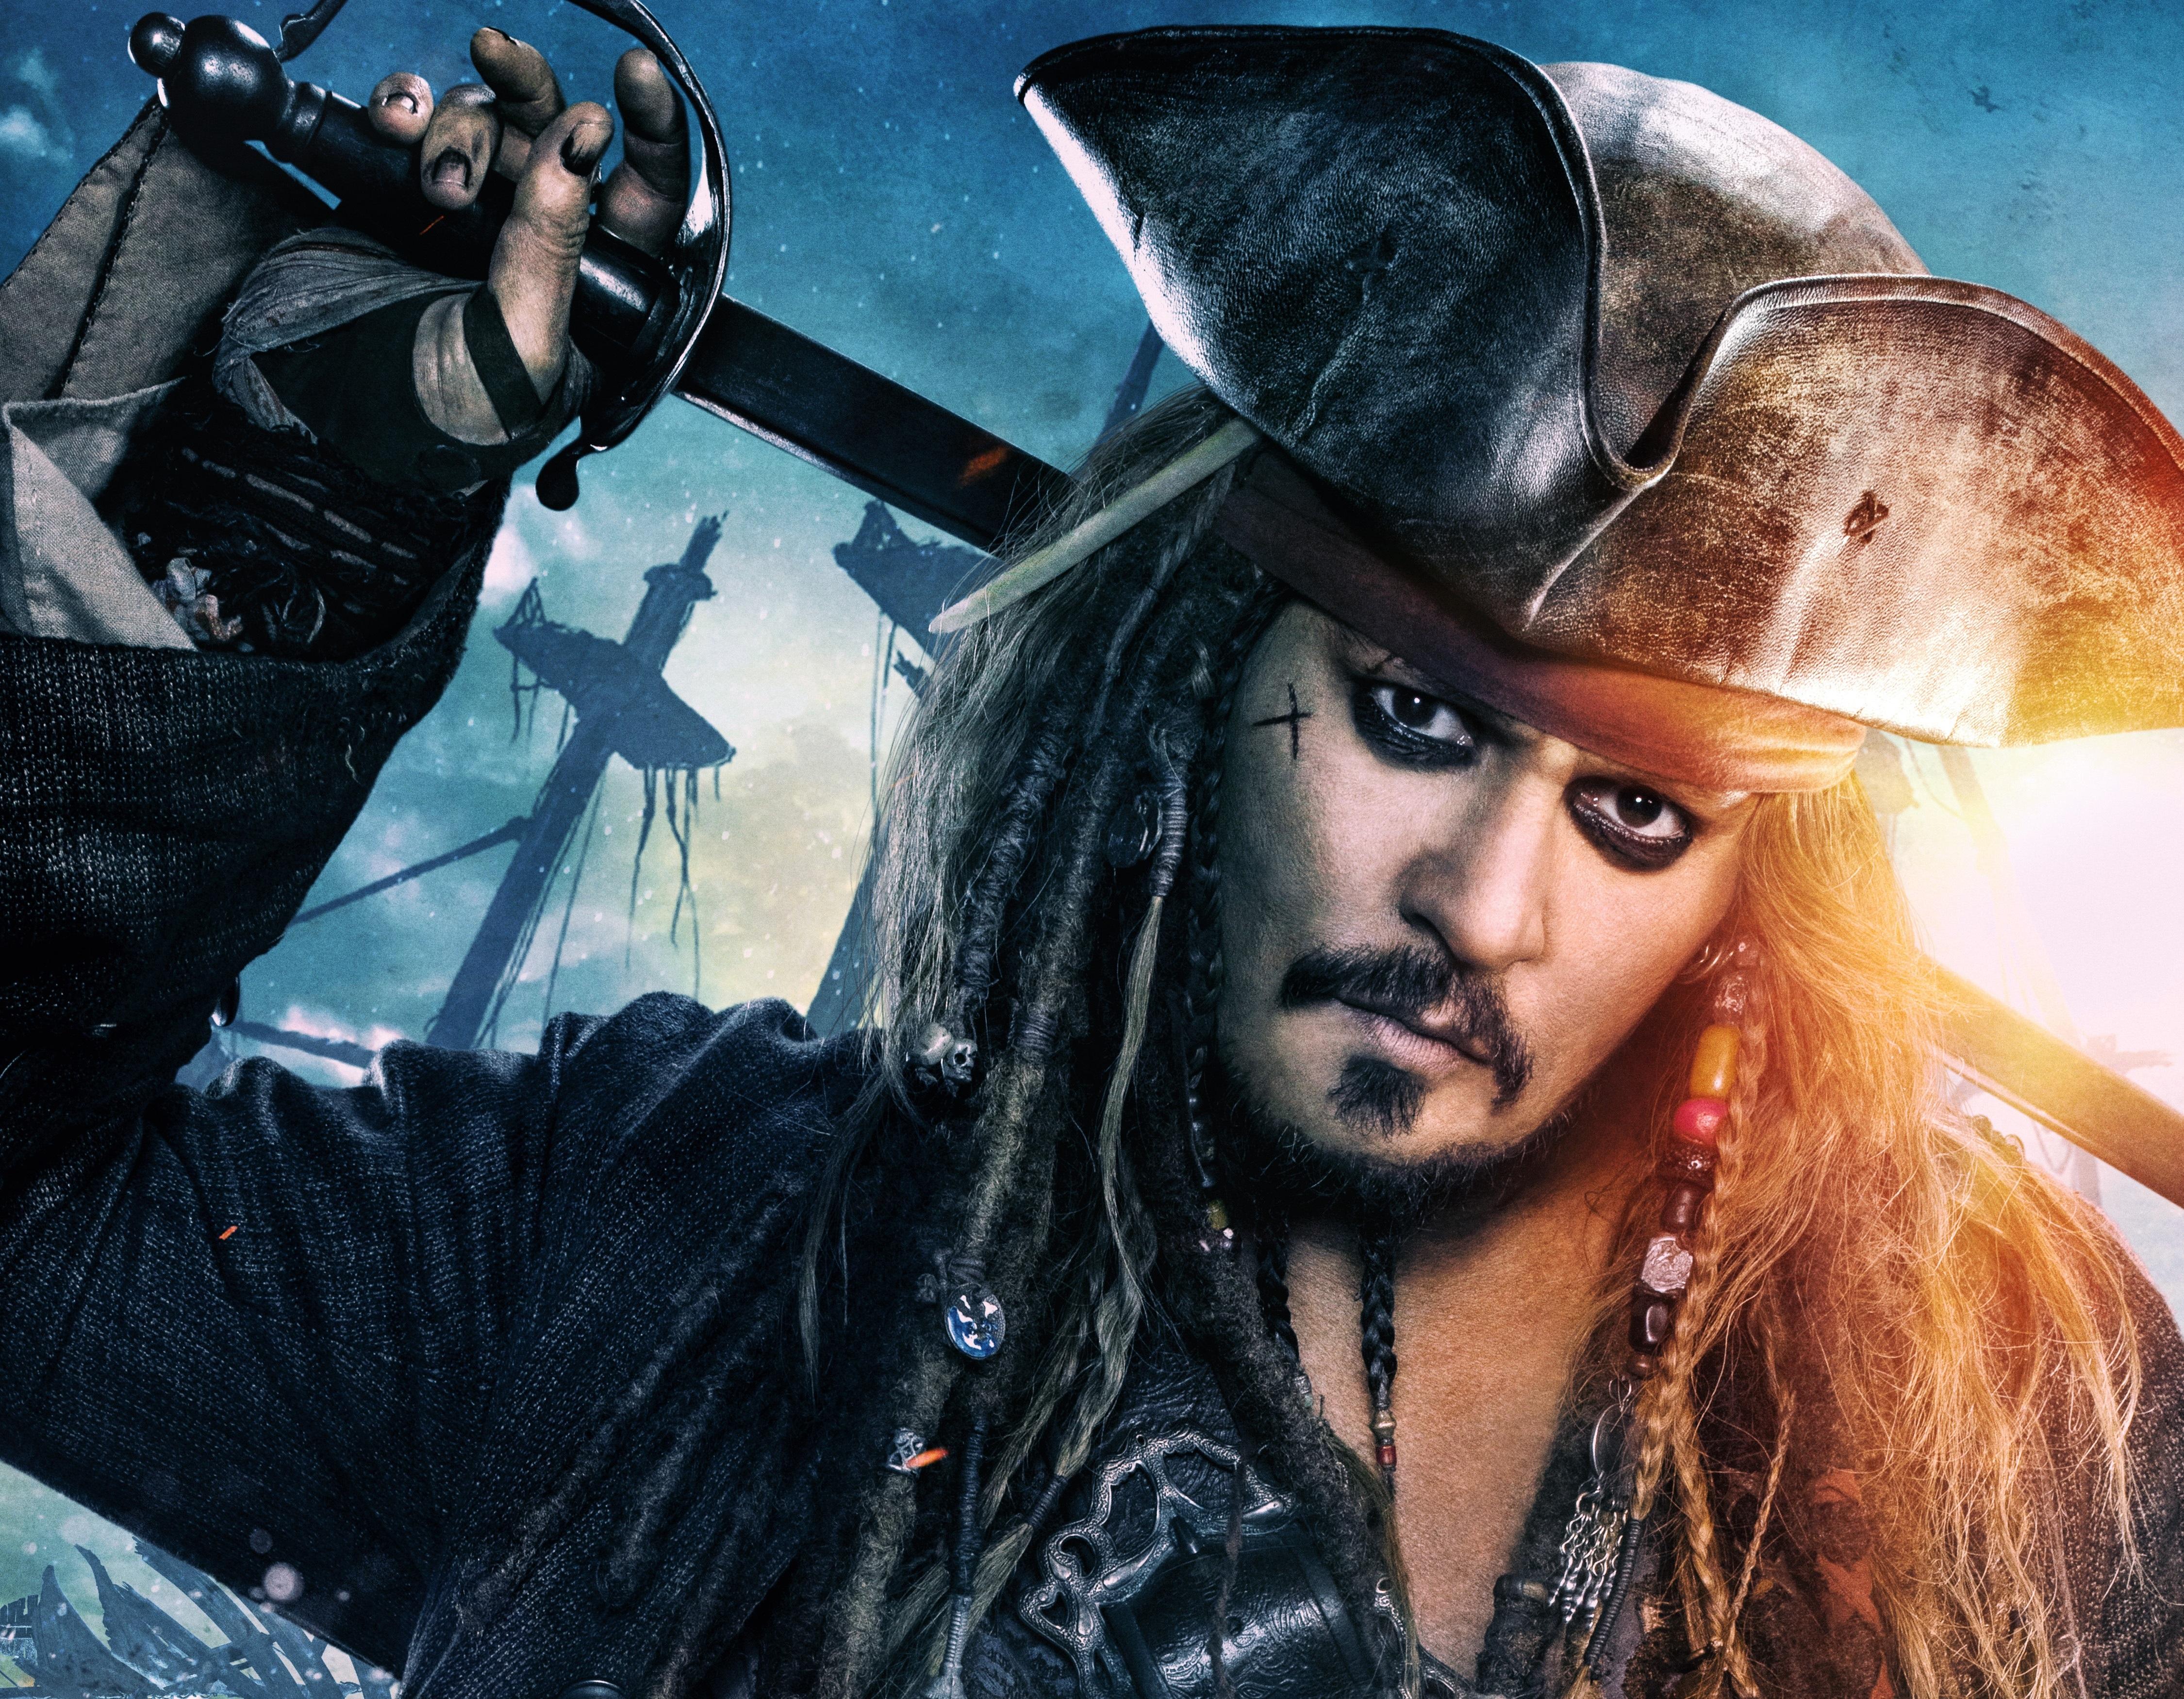 Pirates Of The Caribbean: Dead Men Tell No Tales 4k Ultra